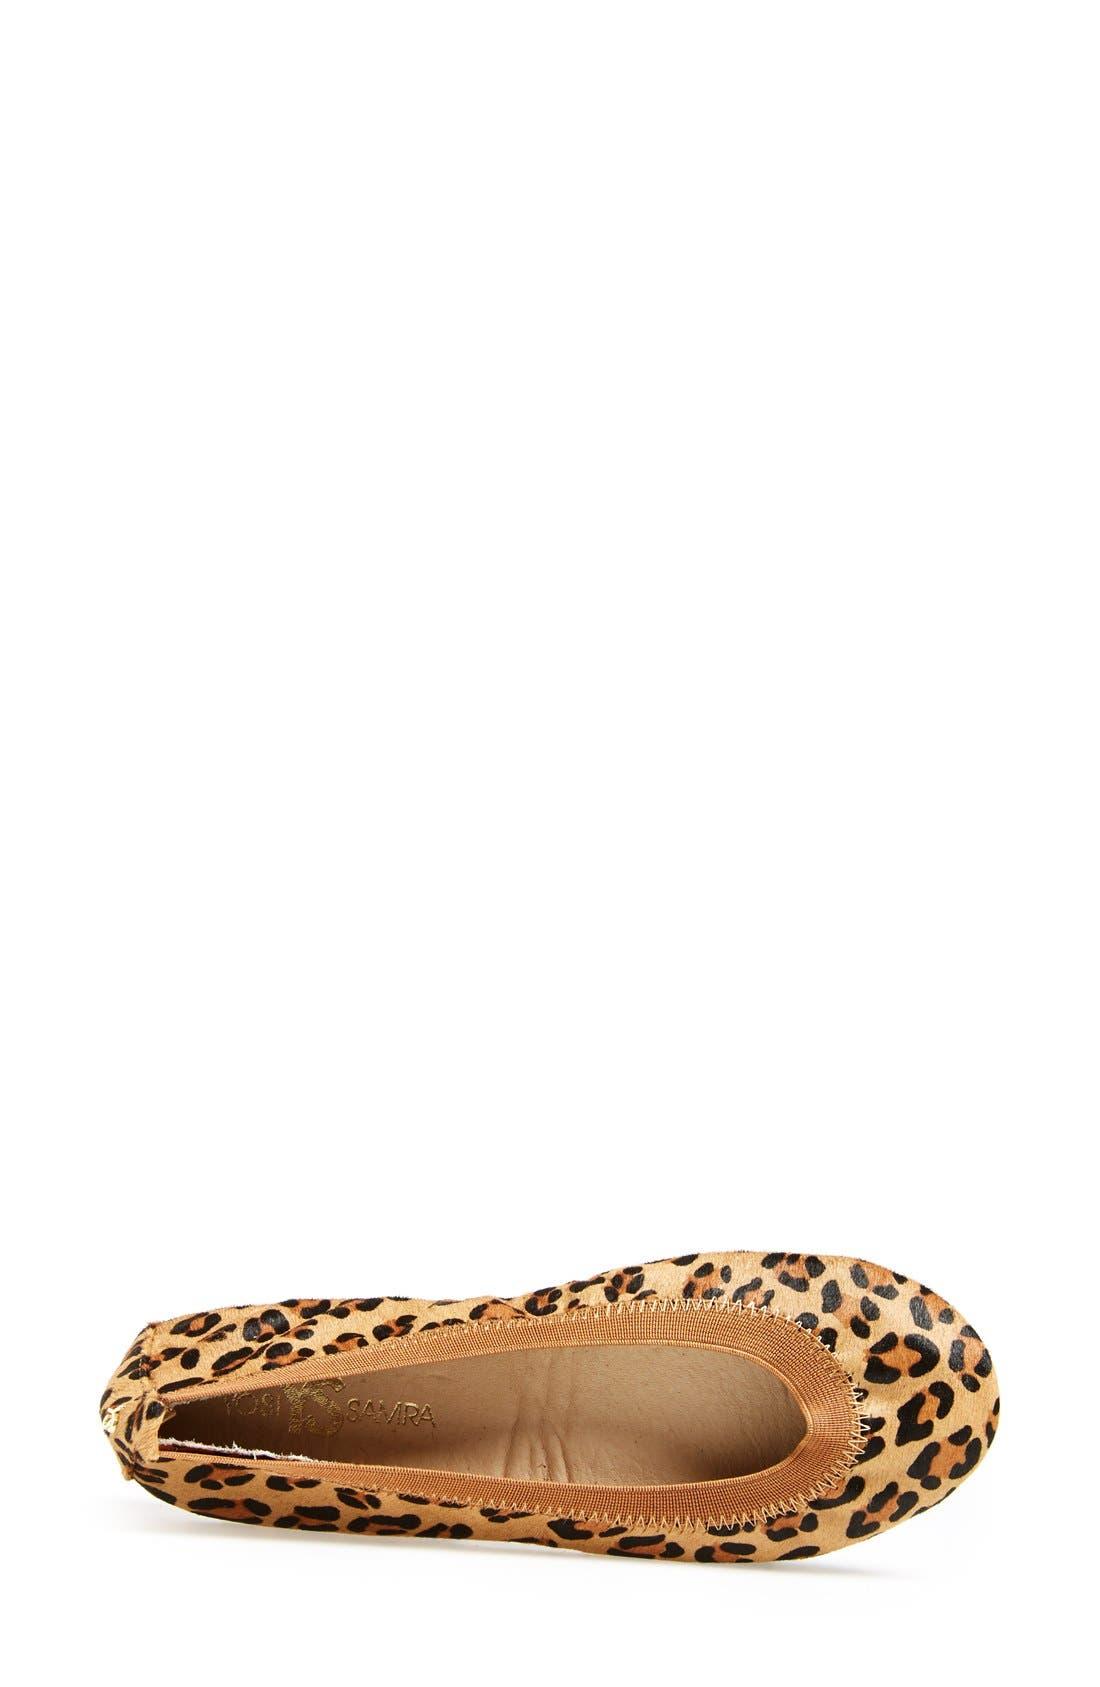 'Samara' Genuine Calf Hair Foldable Ballet Flat,                             Alternate thumbnail 3, color,                             201